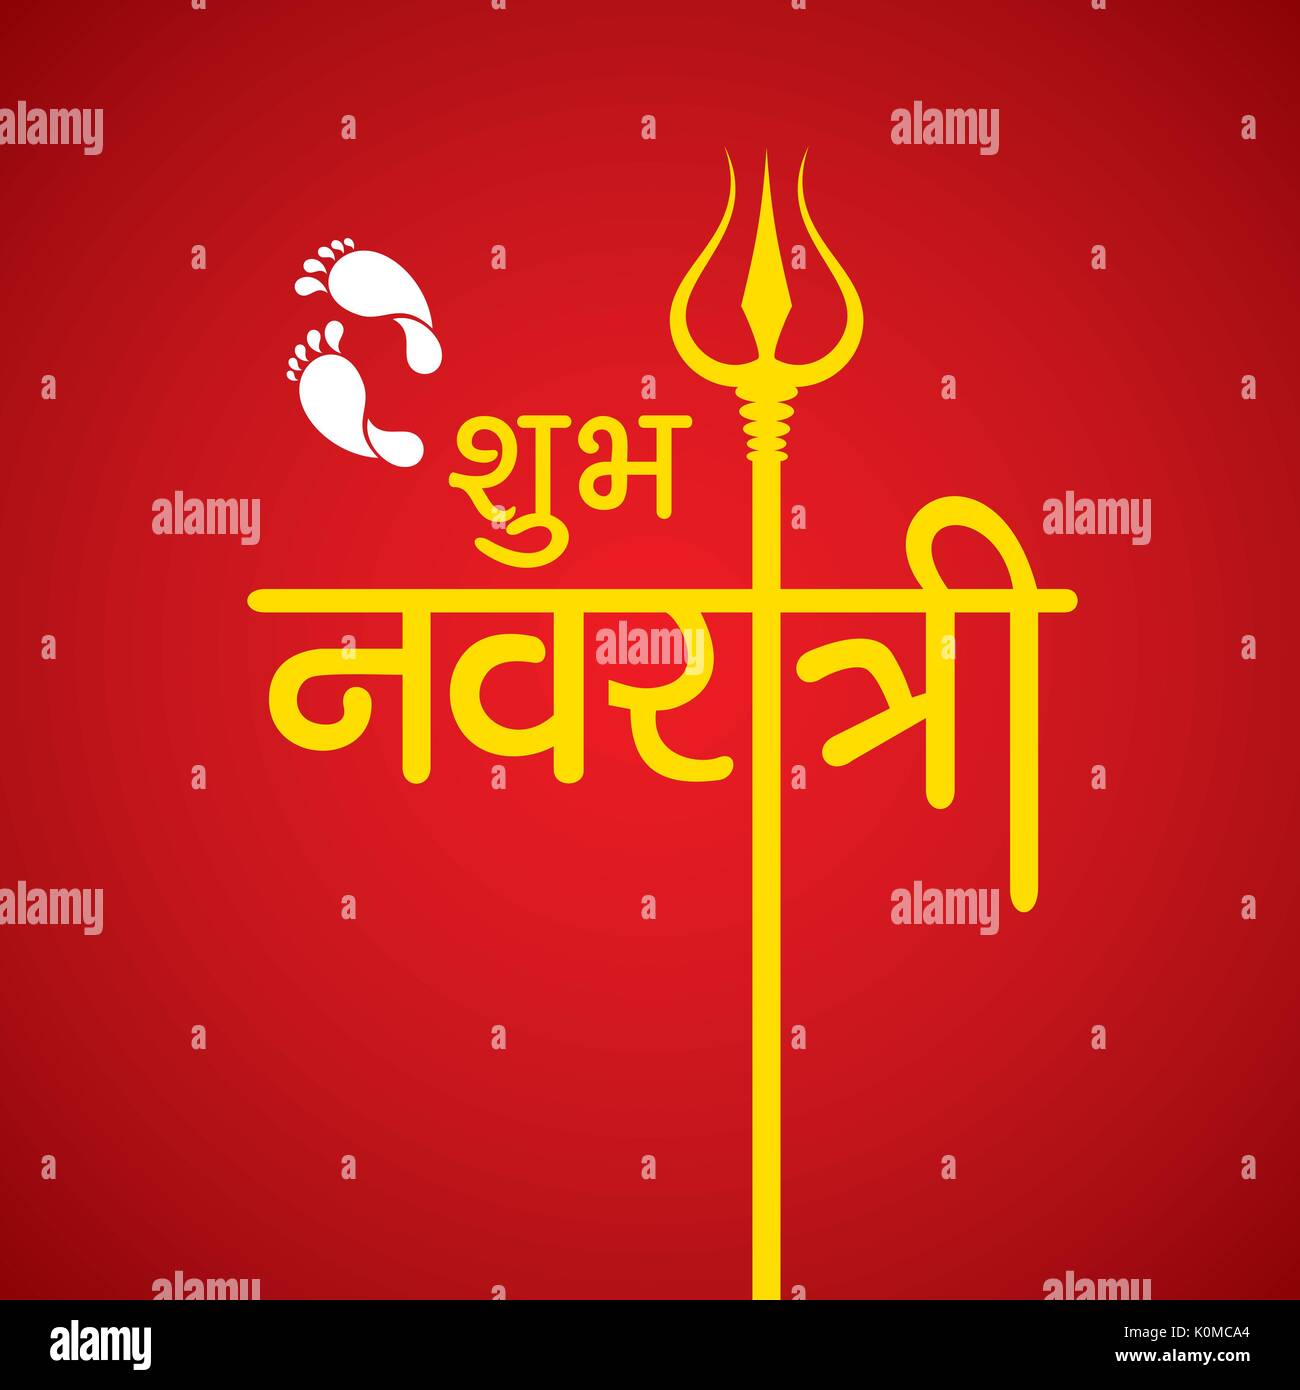 Durga devi stock photos durga devi stock images alamy illustration of navratri utsav greeting card stock image kristyandbryce Choice Image